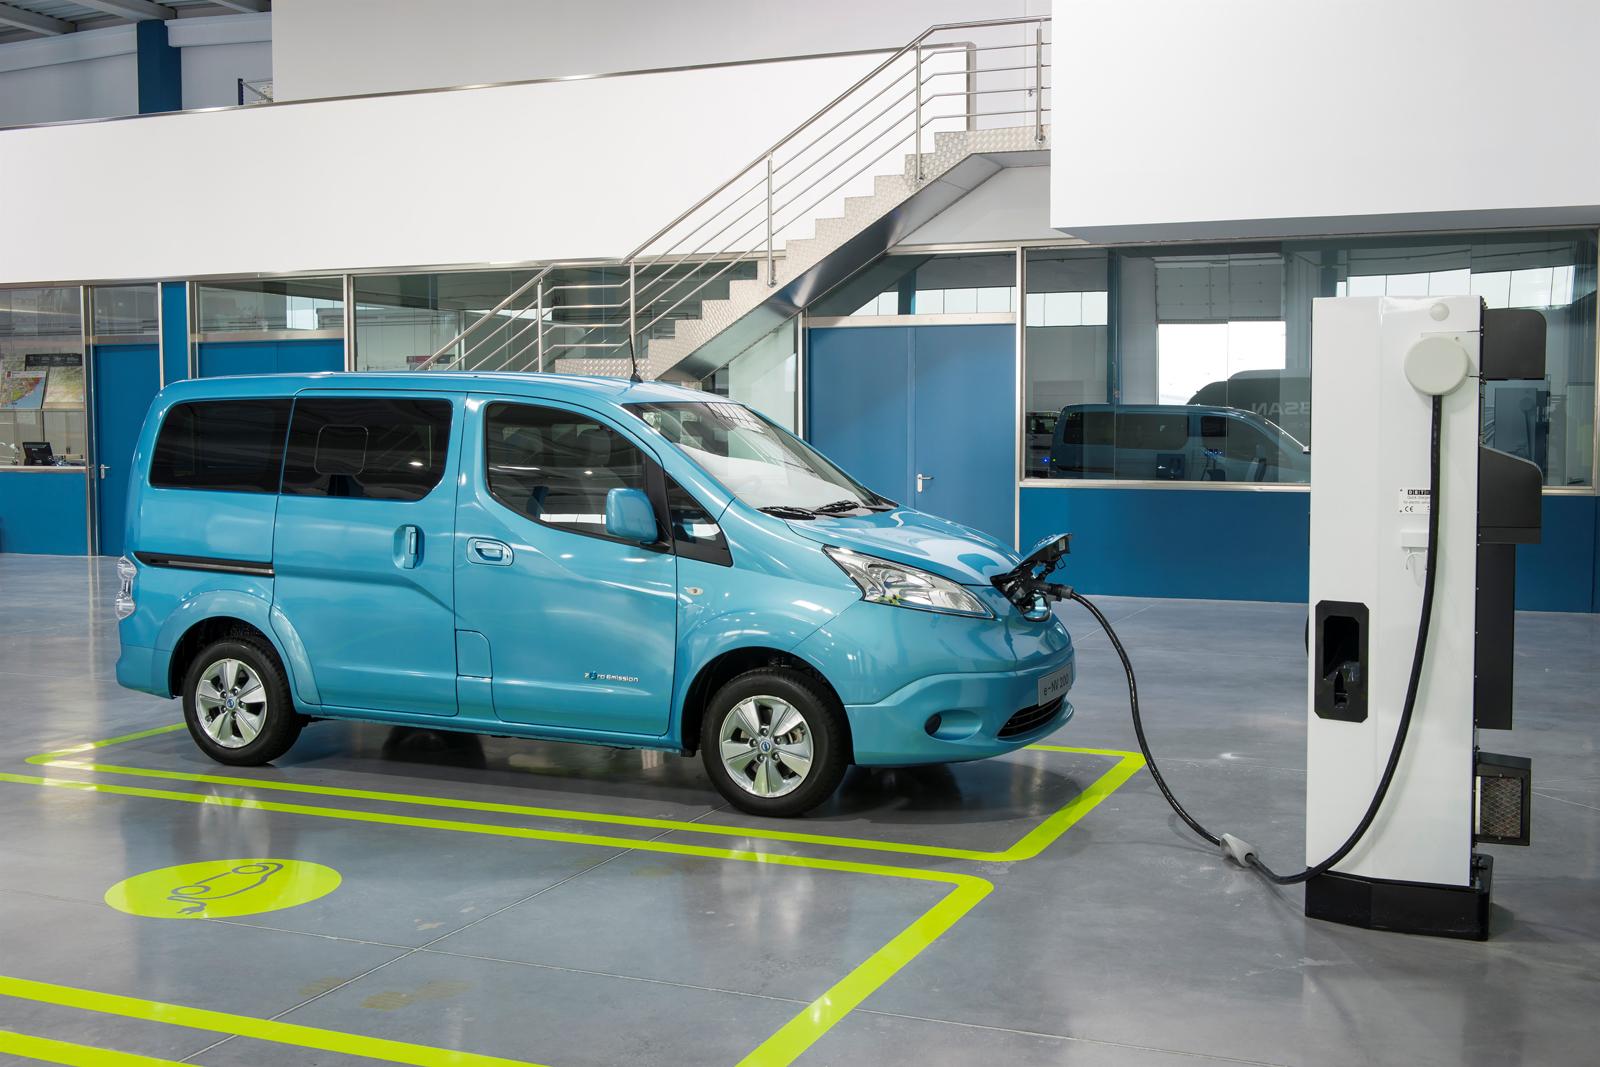 «Ригас силтумс» представит электромобили